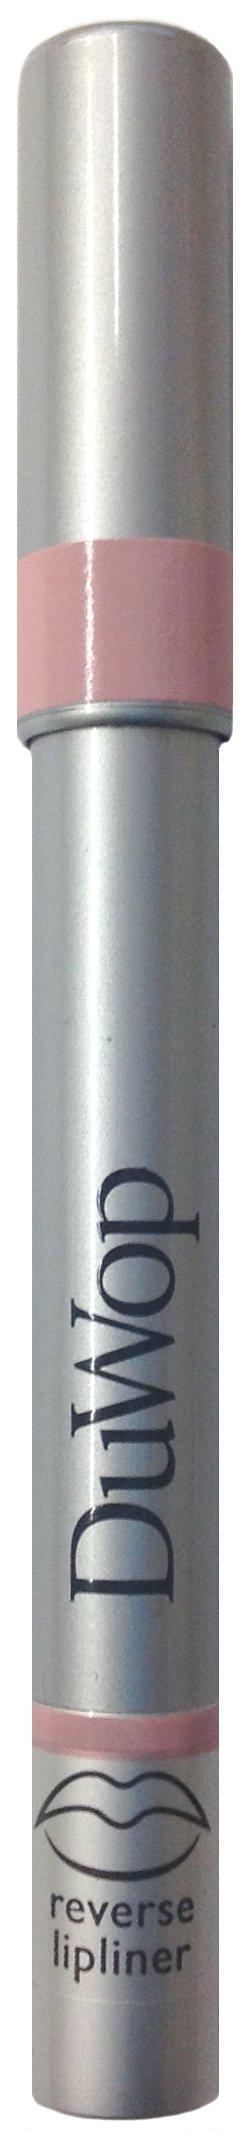 DuWop Cosmetics Reverse Lip Liner - Nude by DuWop Cosmetics